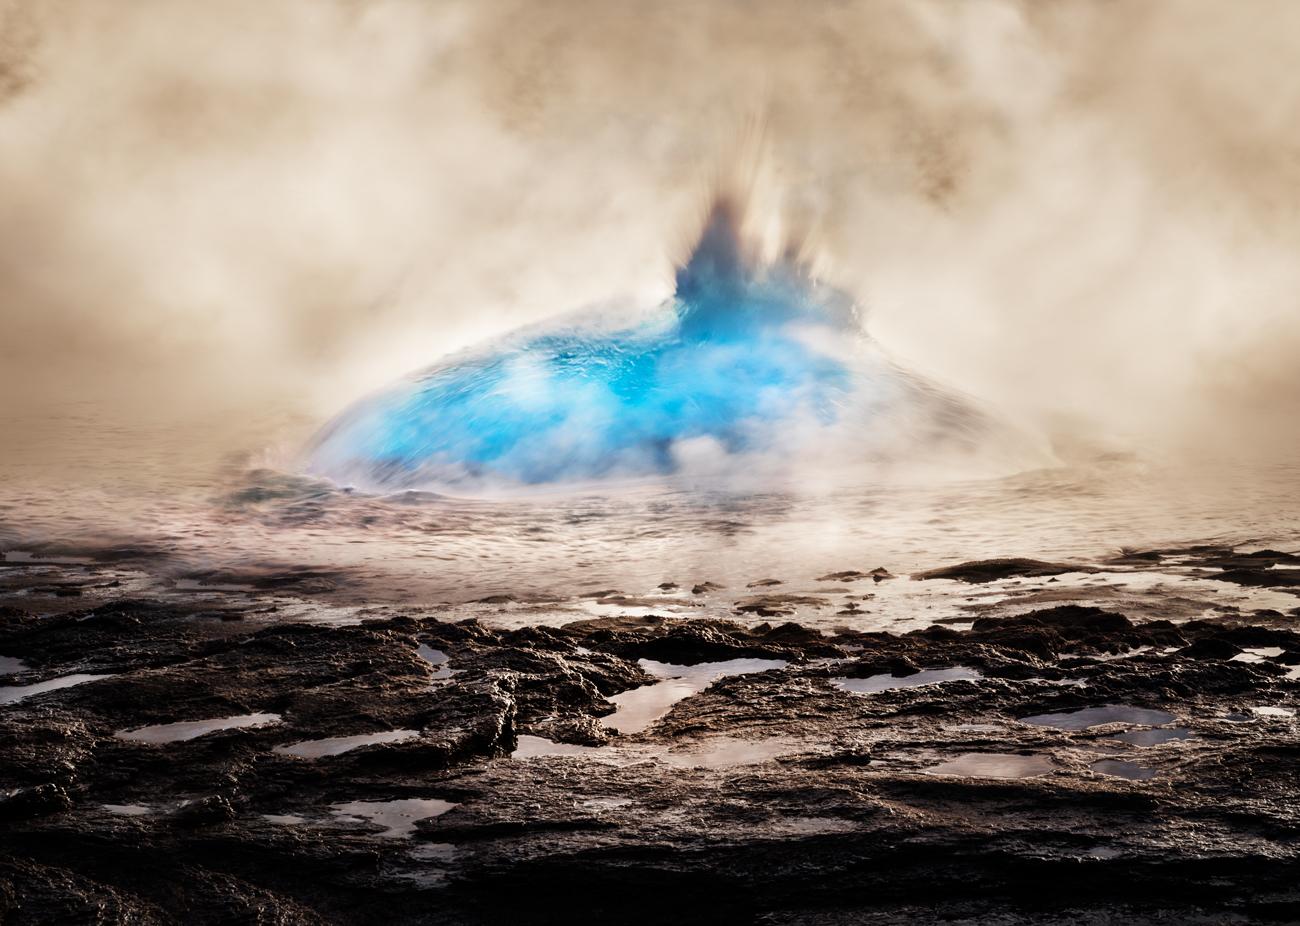 Strokkur (Haukadalur Geothermal Area, Sudurland Region - 2015) - Strokkur (Haukadalur Geothermal Area, Sudurland Region - 2015) - Icelandica   Dani Vottero, Travel Photography